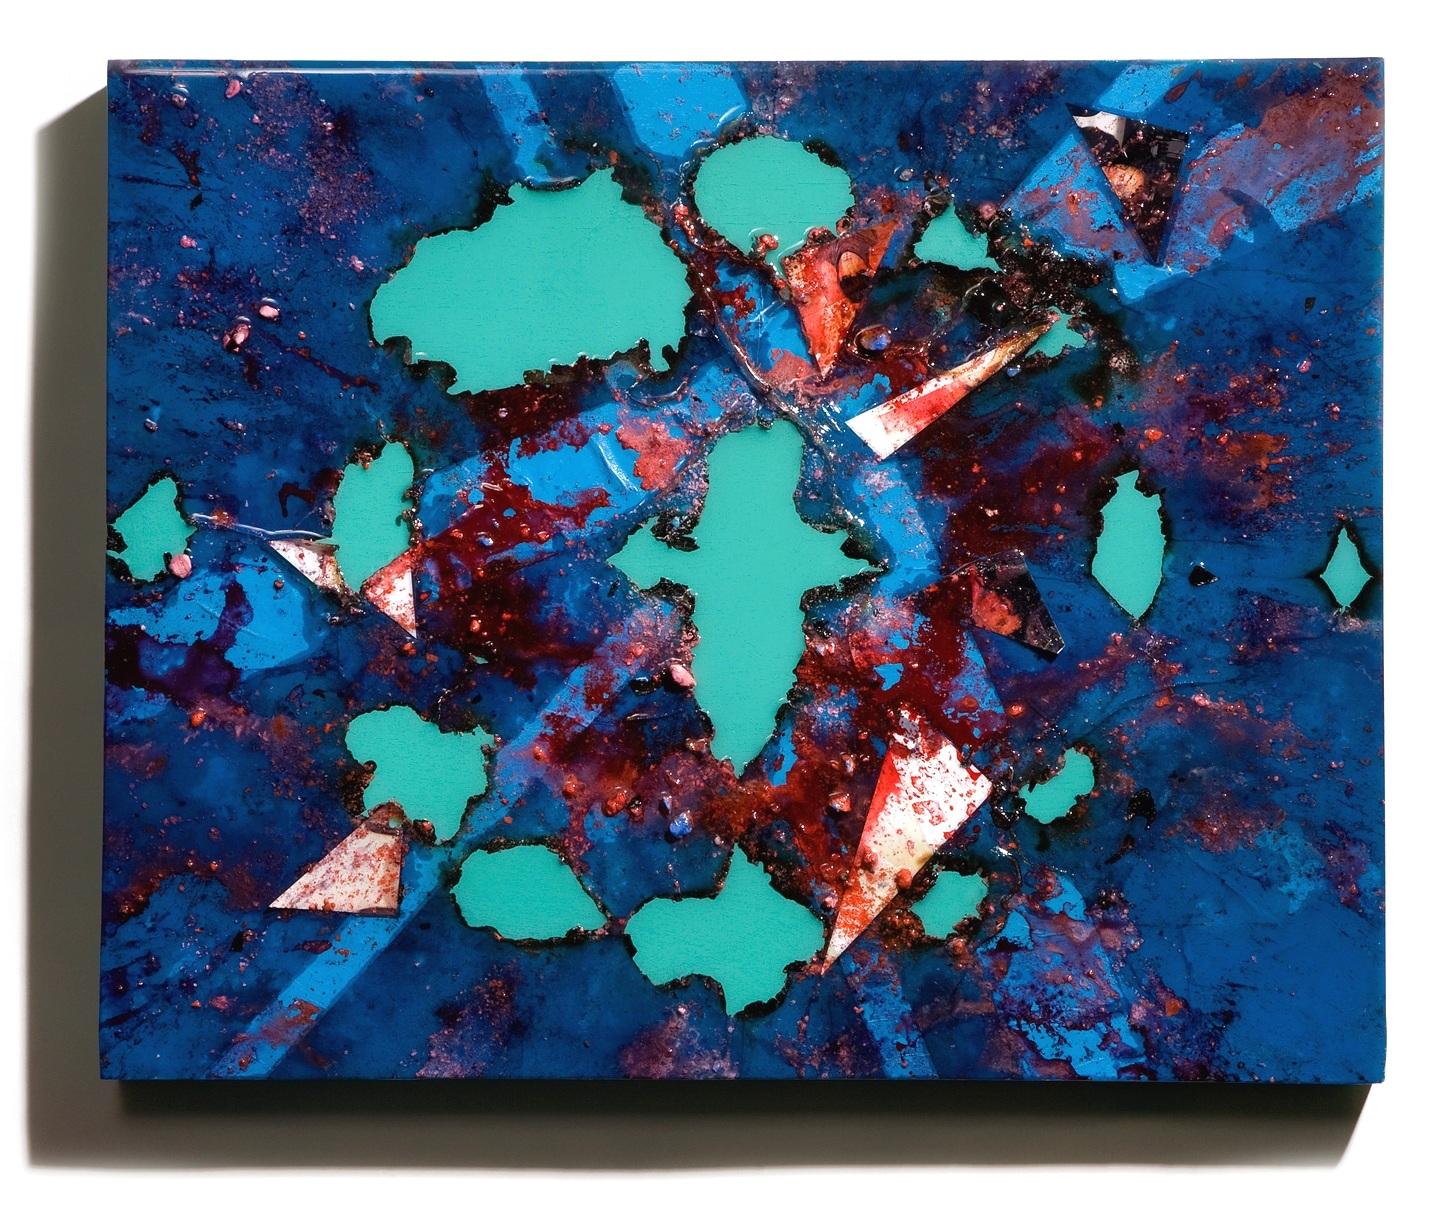 "SERIE I, Untitled (blue/malachite), photographs, photo background paper, chalk, spray paint, packing tape, powder drink, glue, epoxy resin on wood panel, 16""x20""x2"", 2019"